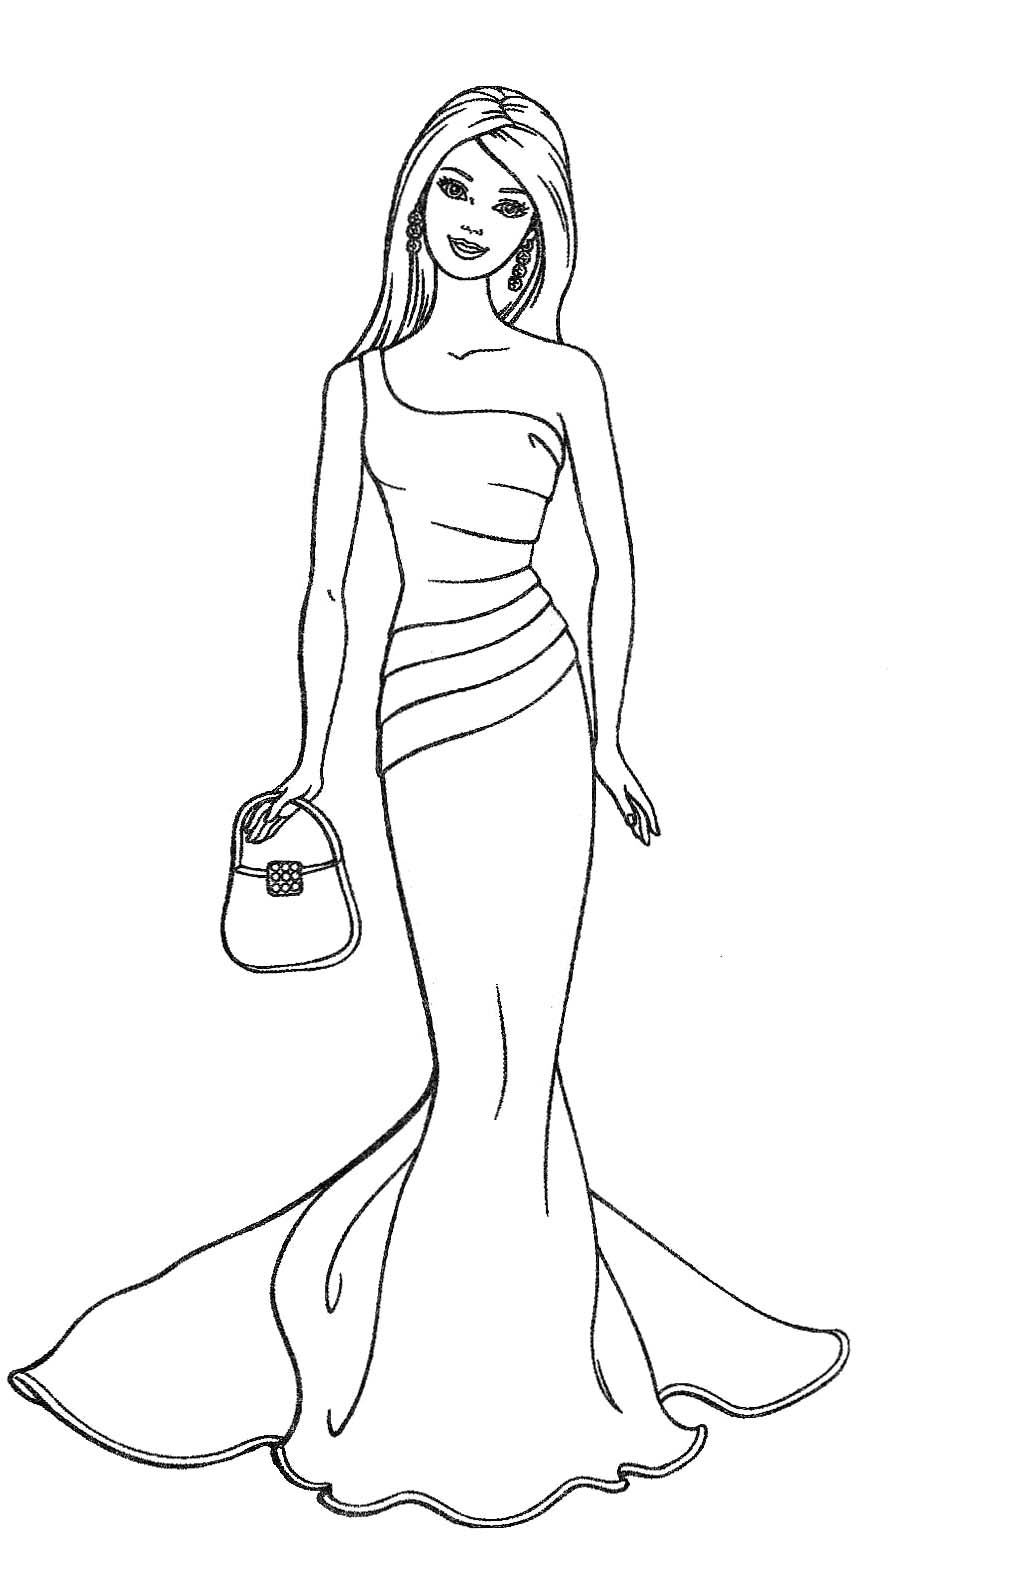 1011x1589 Berbie Doll Pencil Sketch Pic Gallery Barbie Doll Sketch